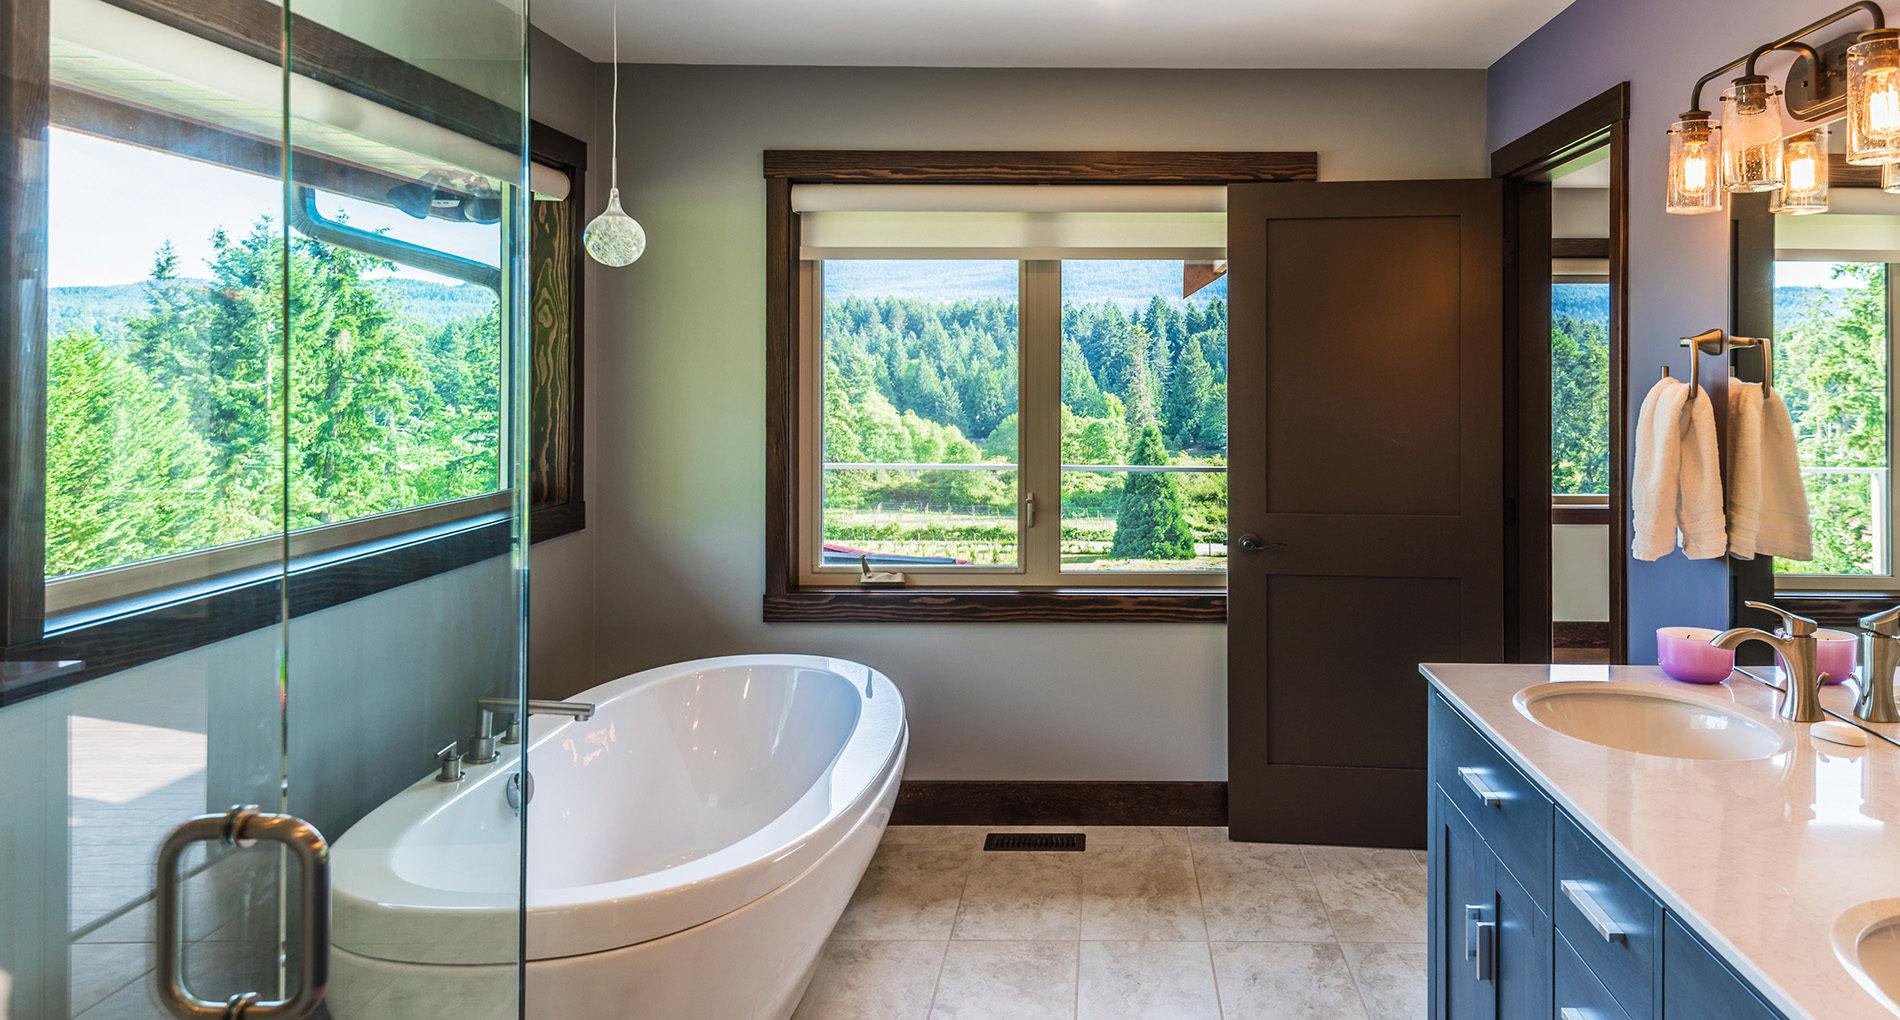 Bathroom Renovation North Island Chateauwolff Slider